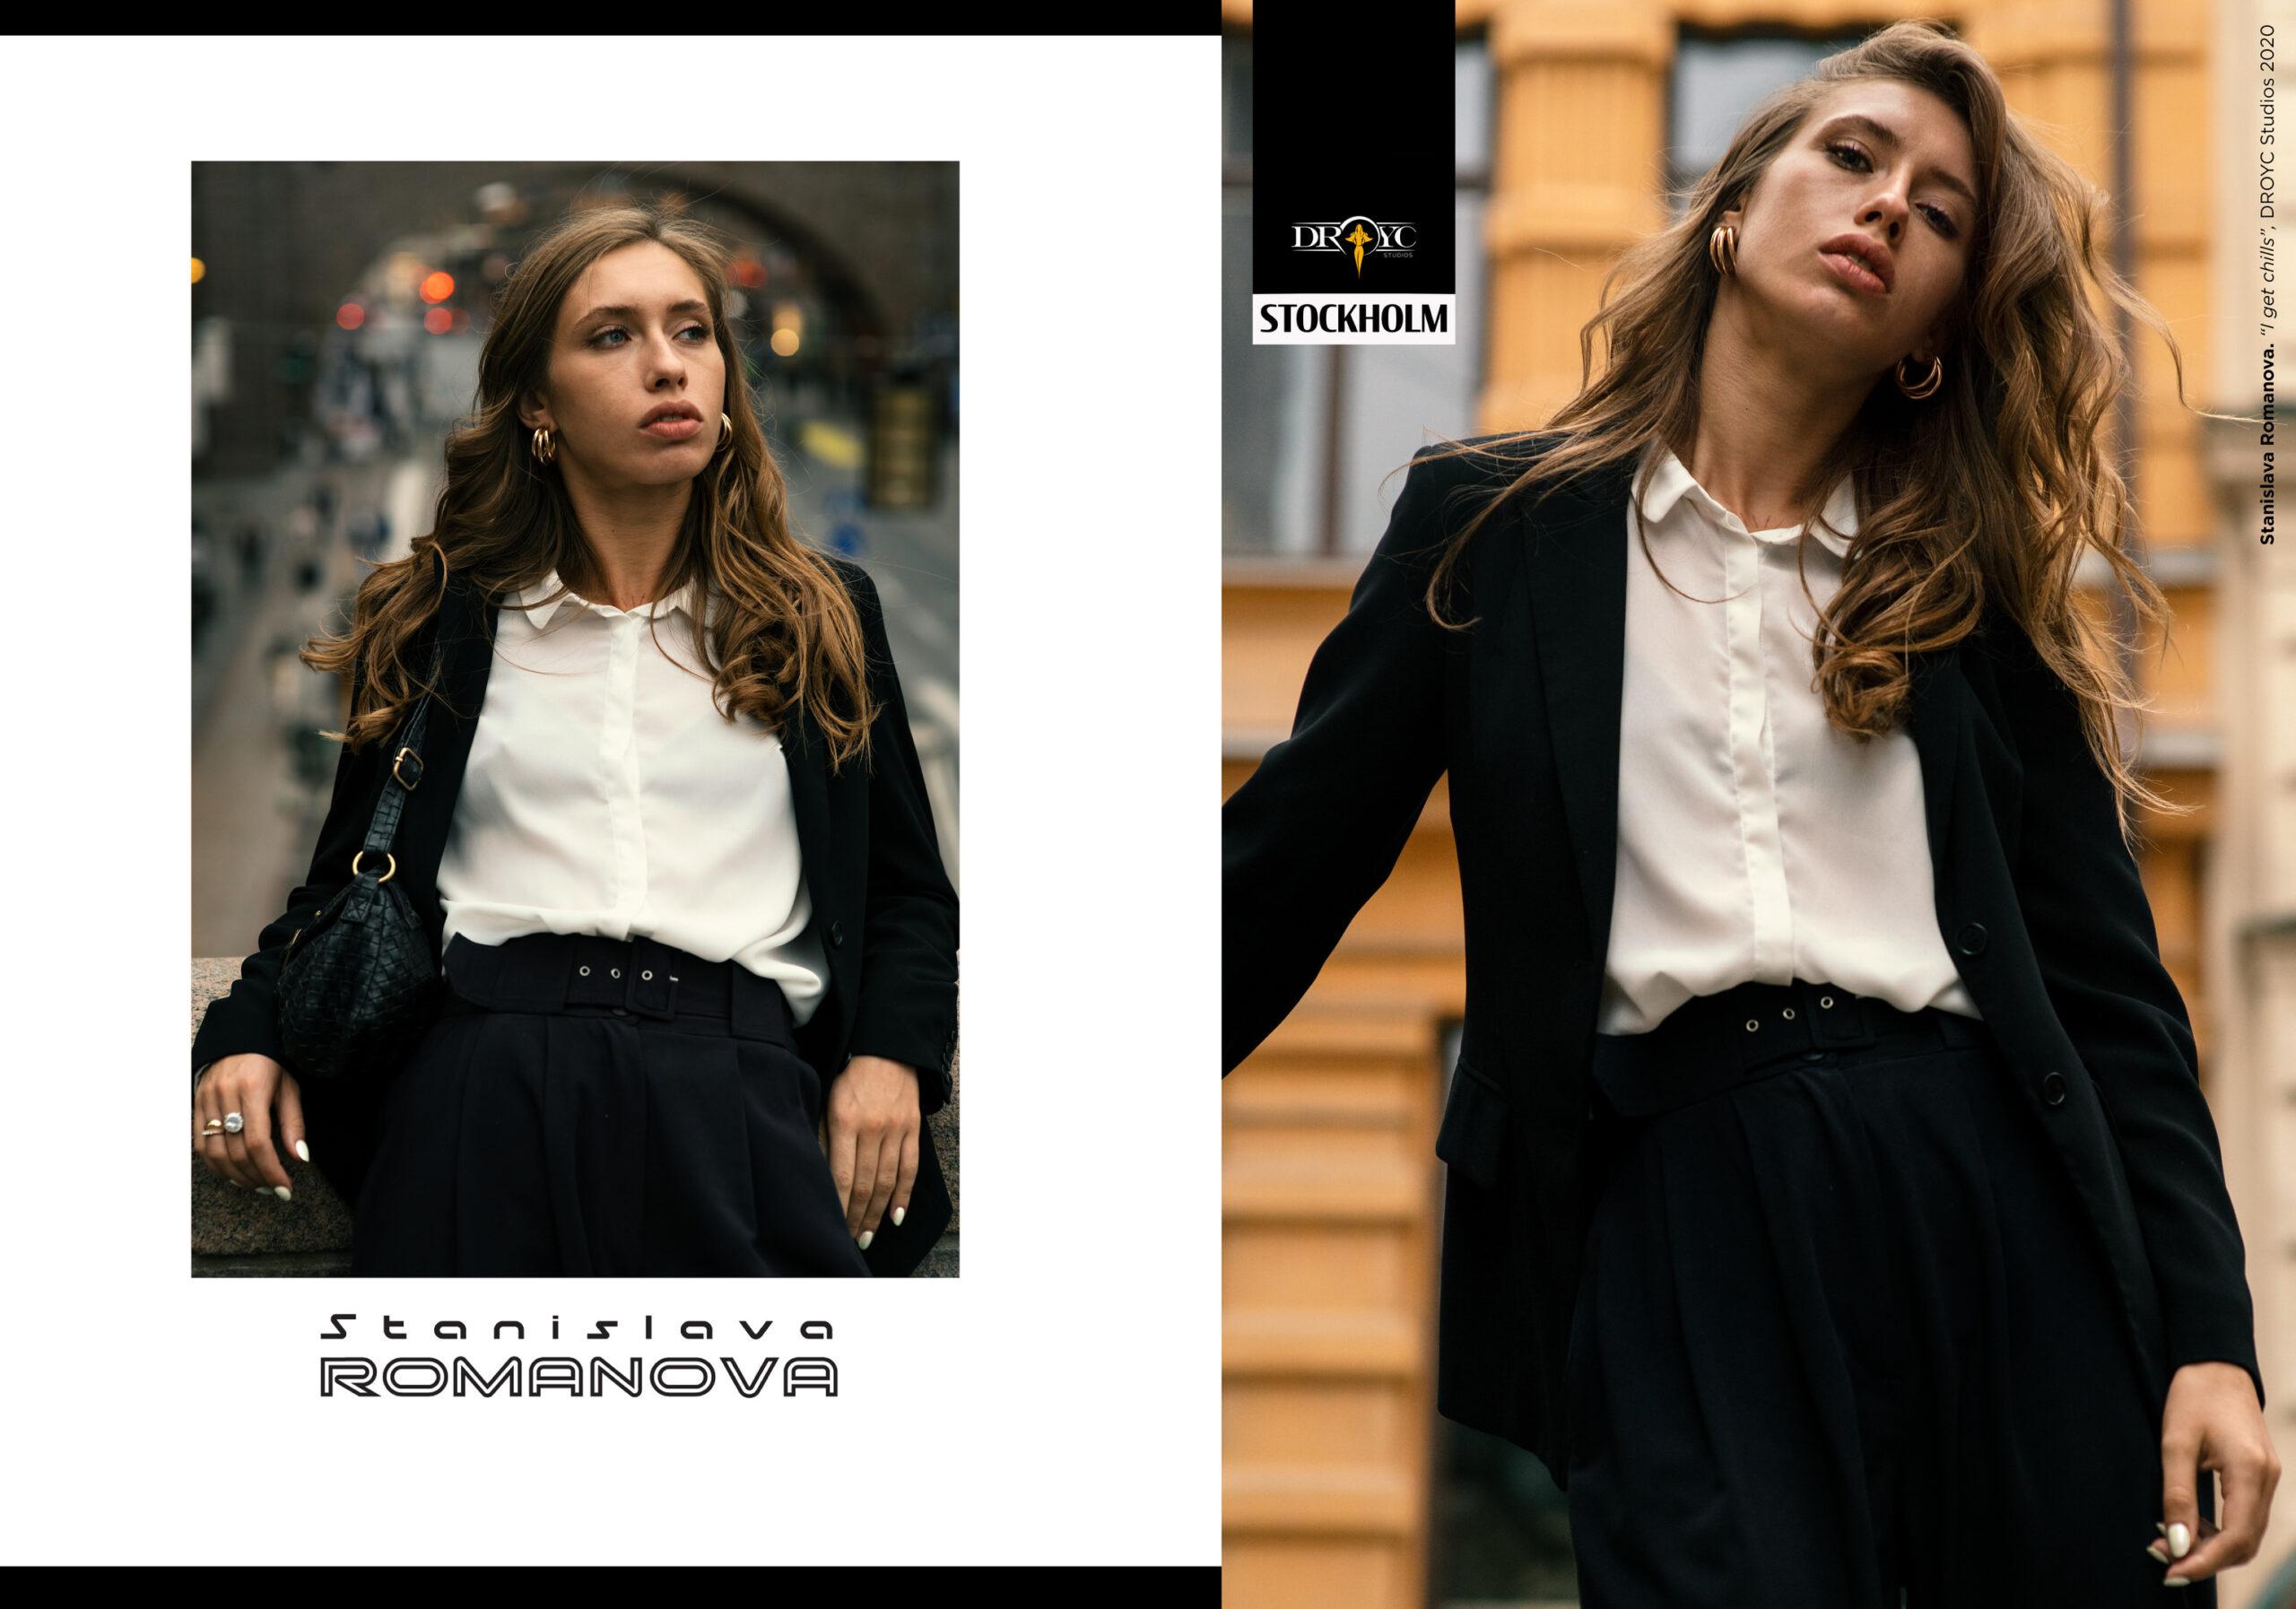 StanislavaRomanova-DROYC-I_get_chills-30b